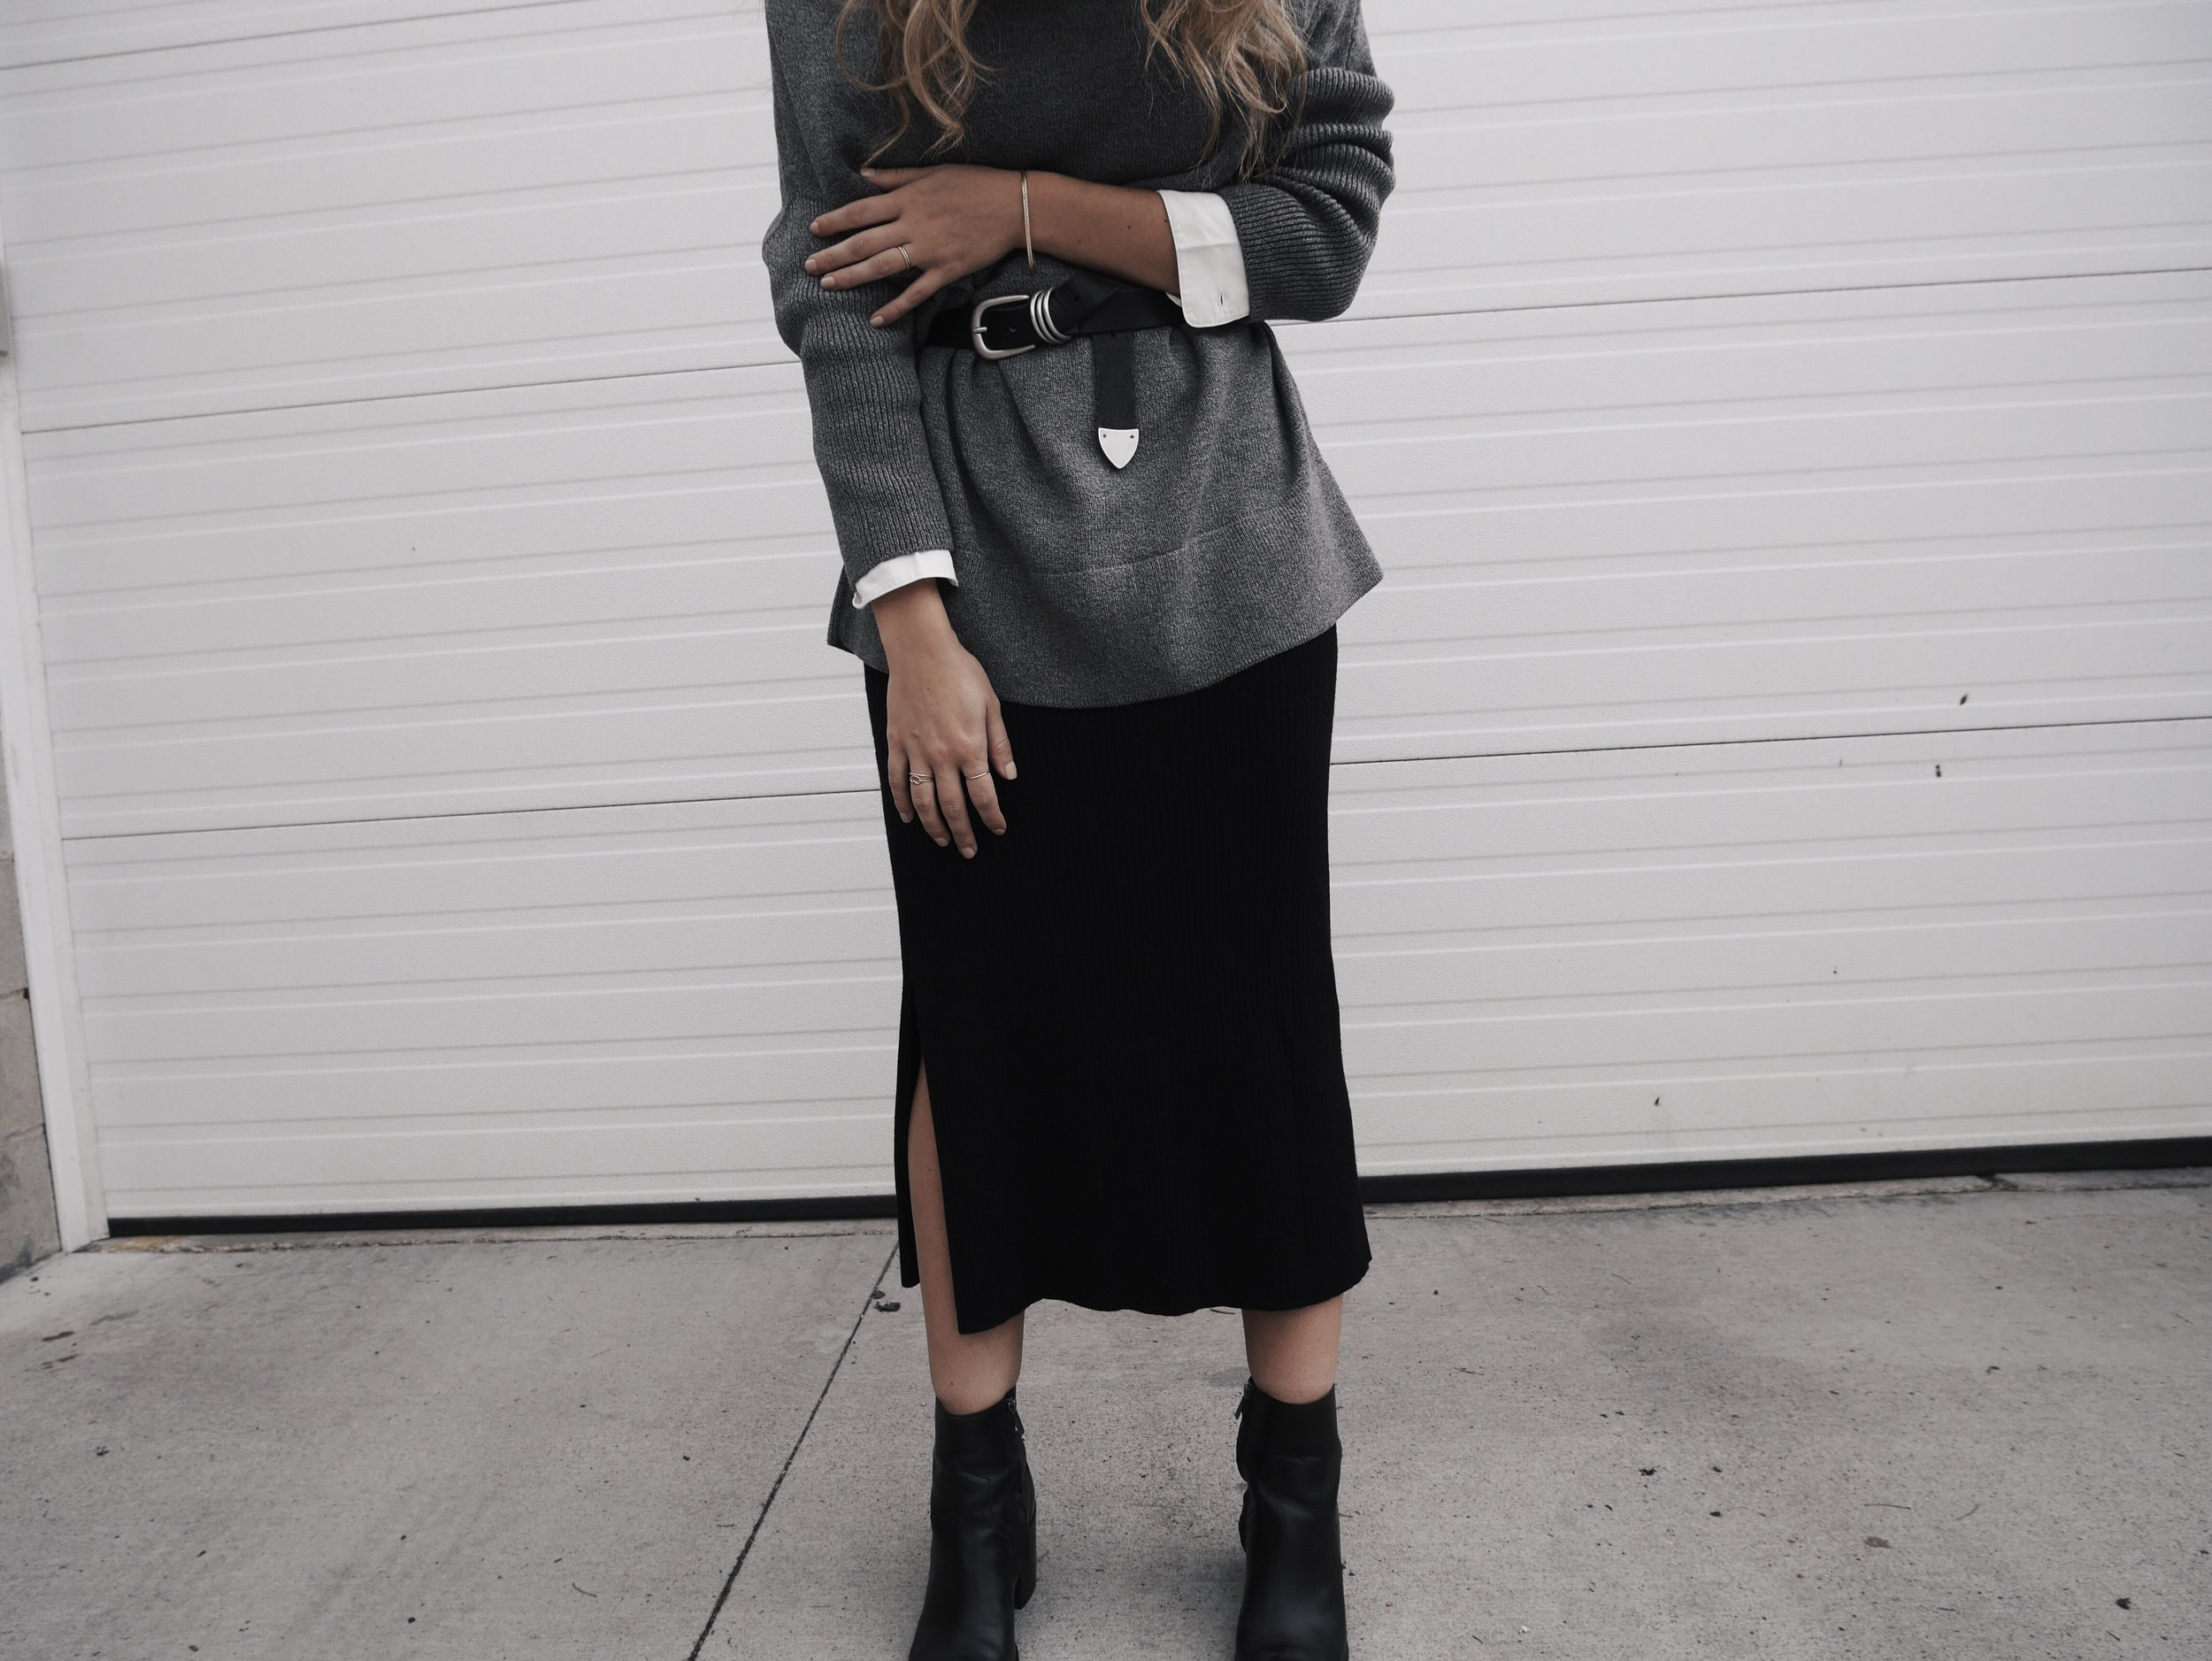 Jessica-Lambi-Vetta-Capsule-Details.jpg